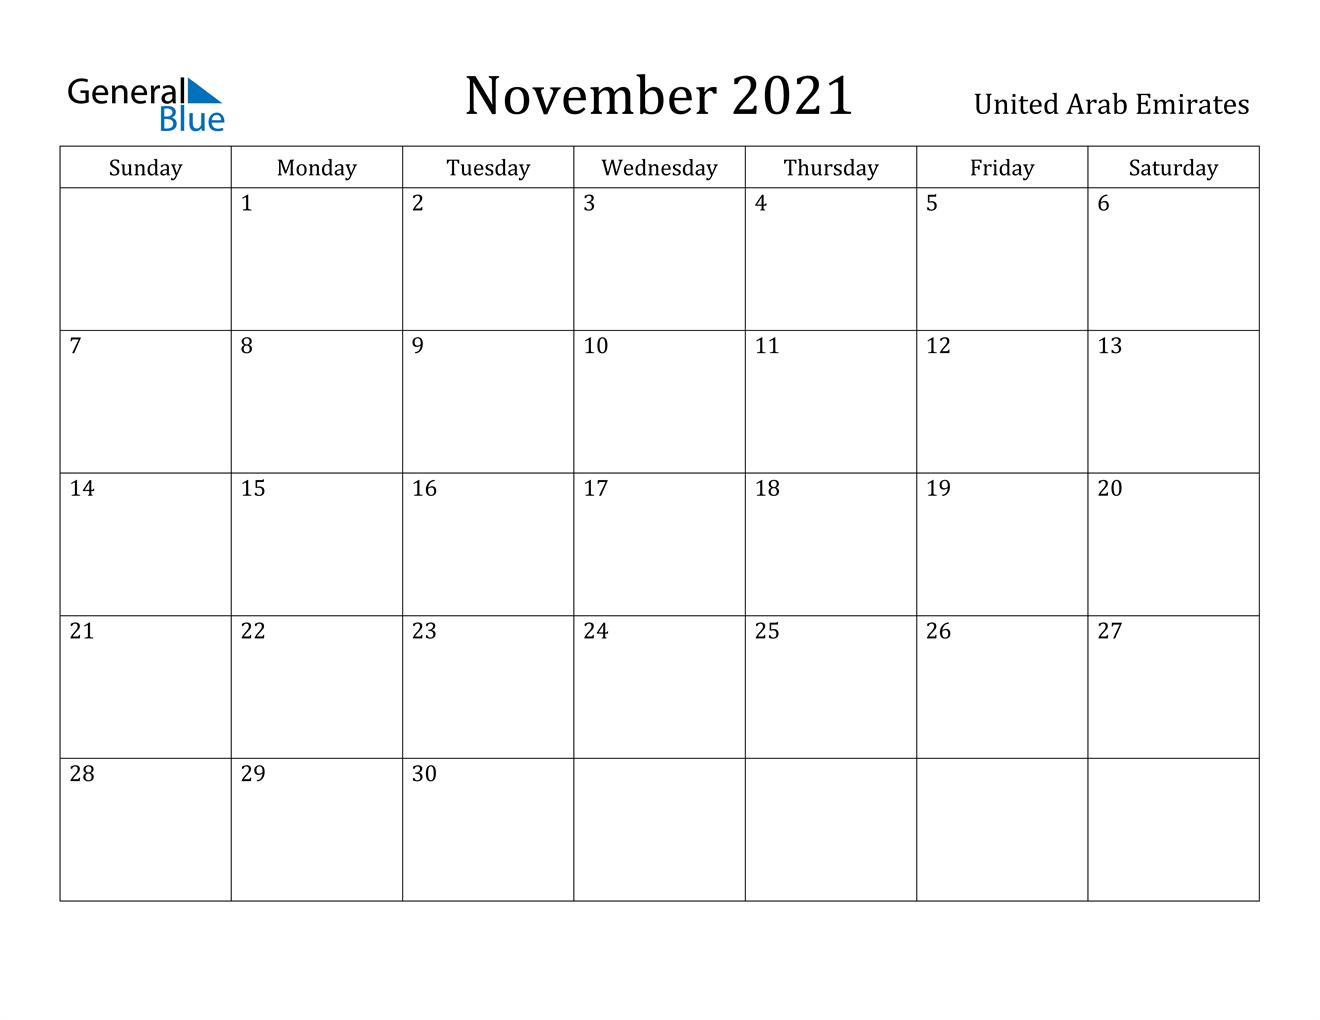 November 2021 Calendar - United Arab Emirates